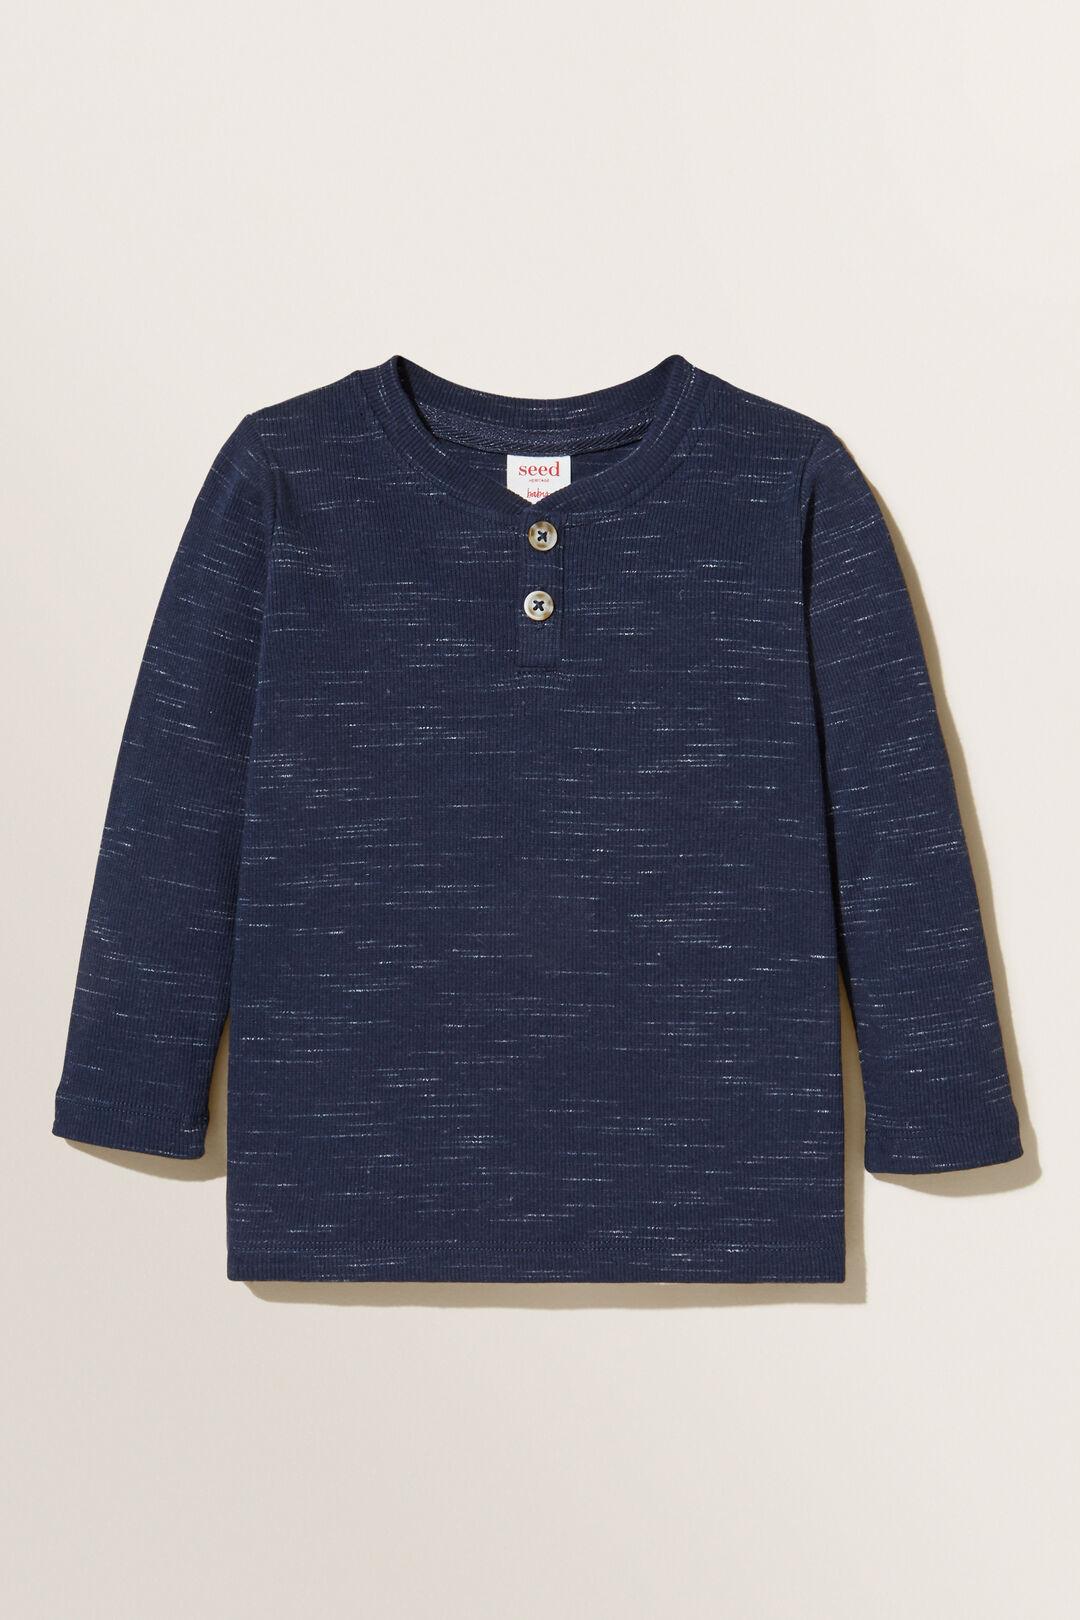 Henley Long Sleeve Tee  MIDNIGHT BLUE  hi-res